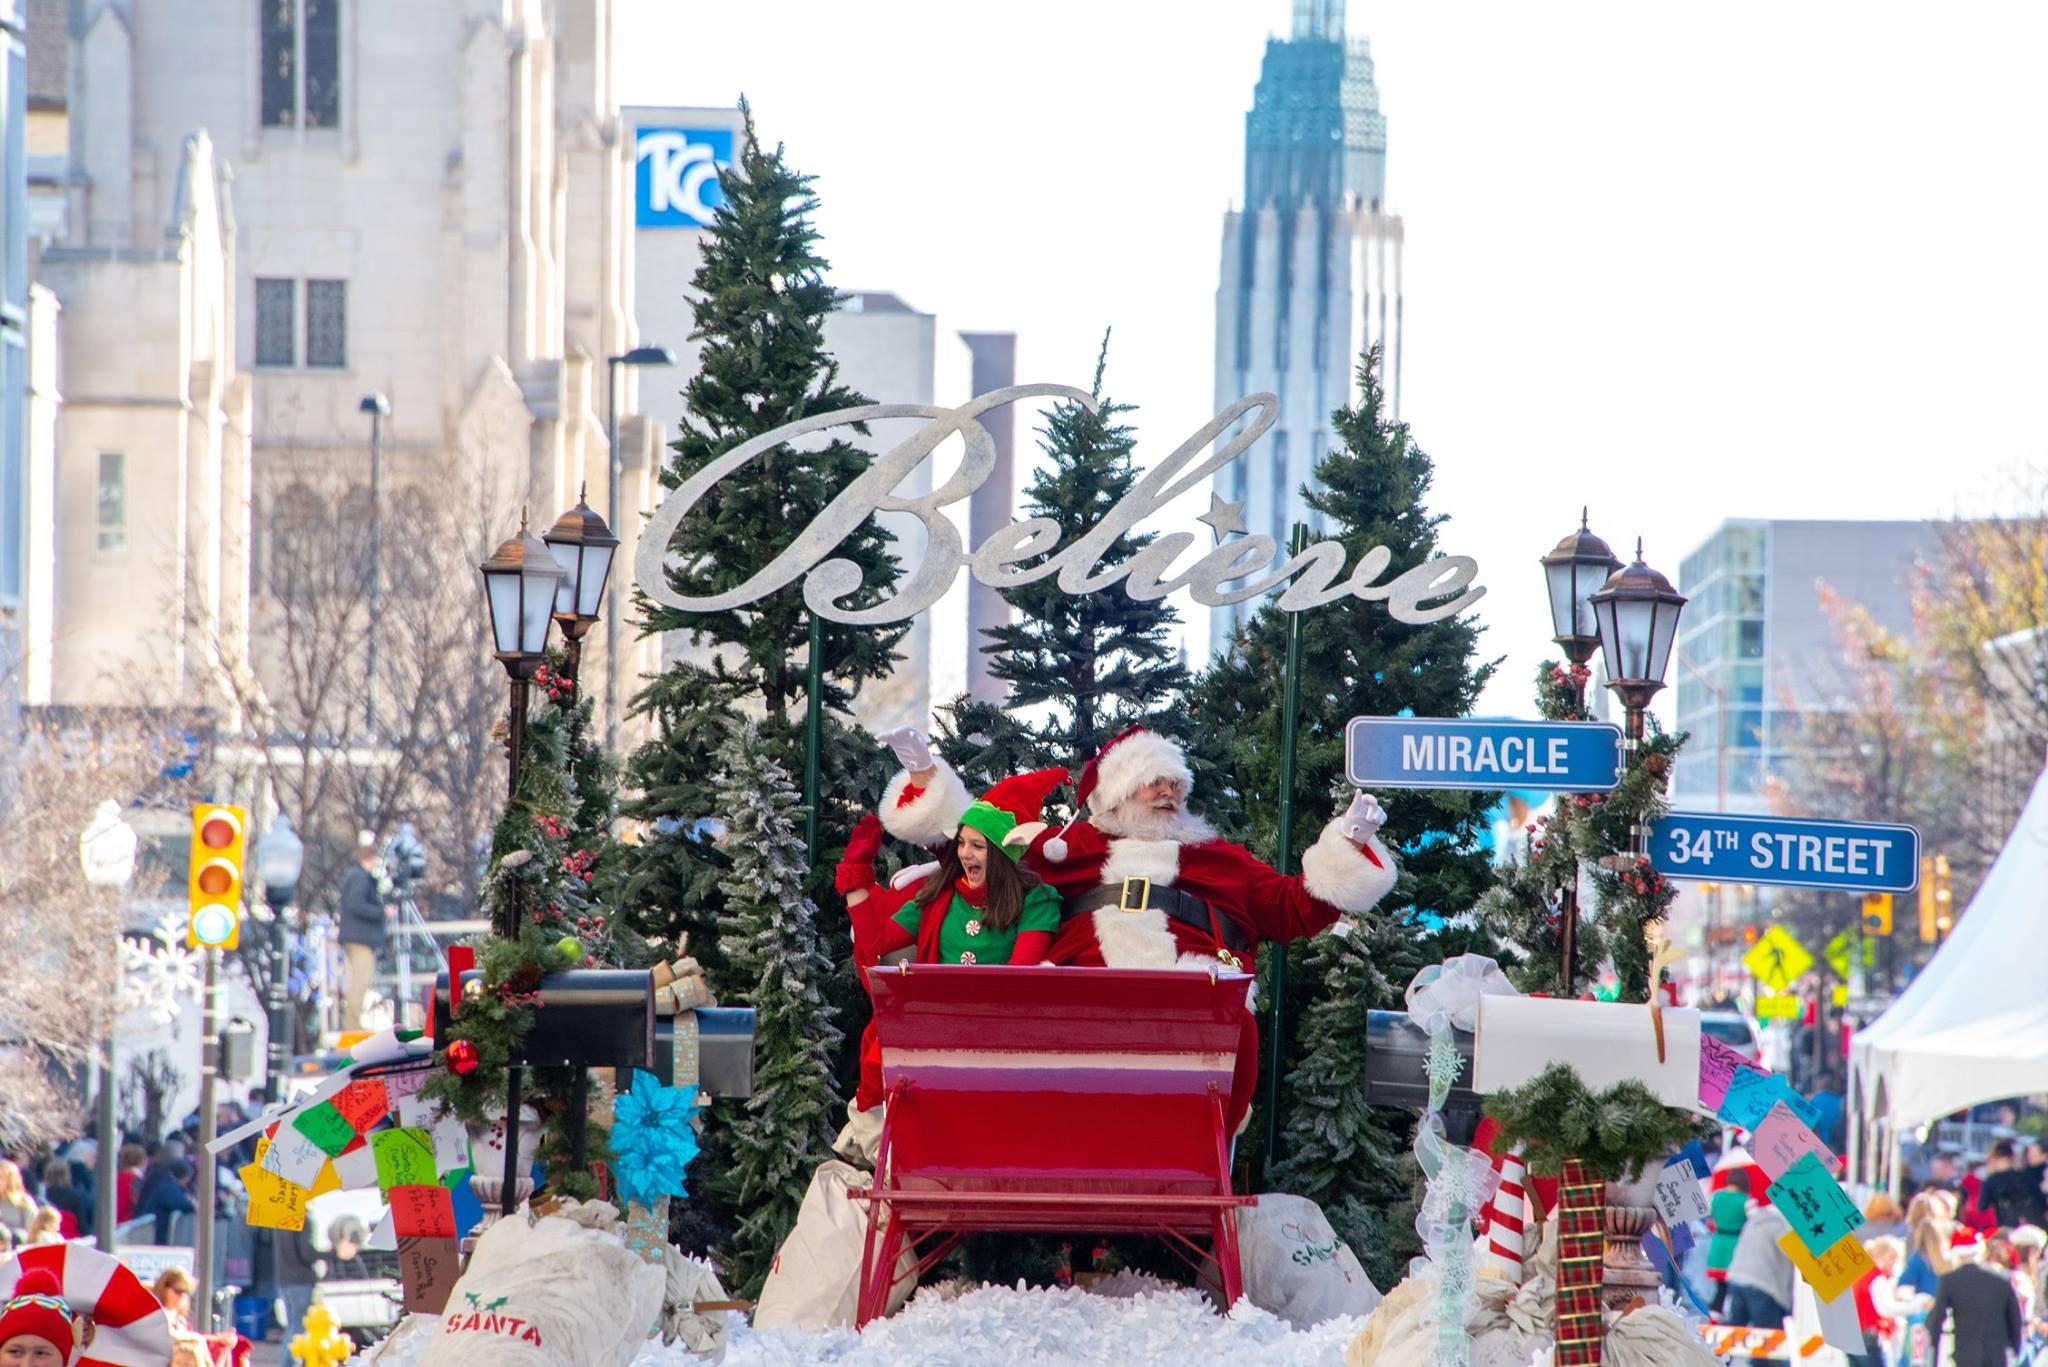 Tulsa Christmas Parade downtown Tulsa, Oklahoma